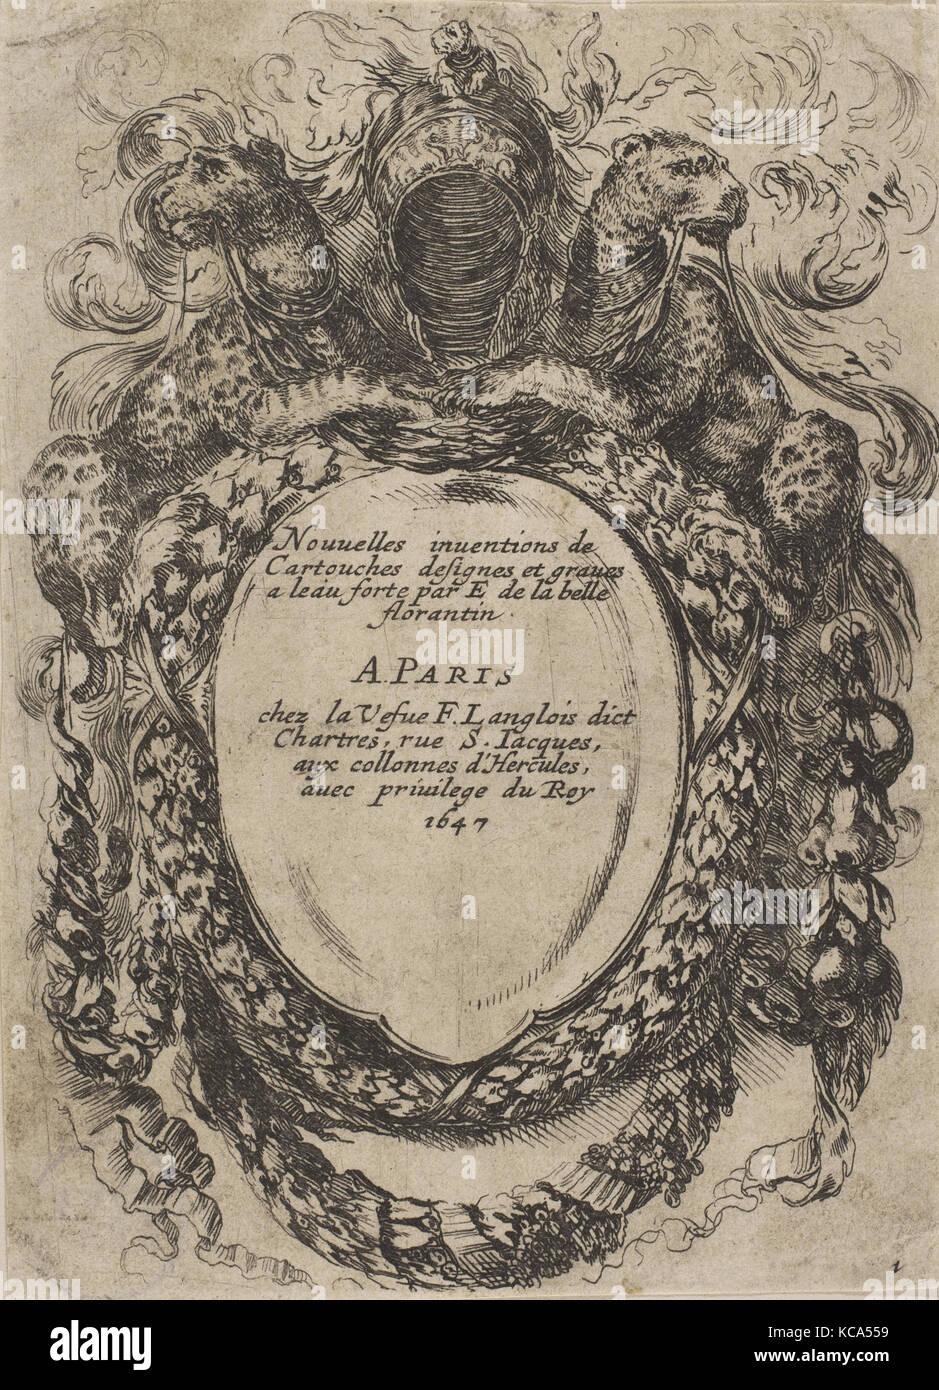 1647 1649 Stockfotos & 1647 1649 Bilder Alamy